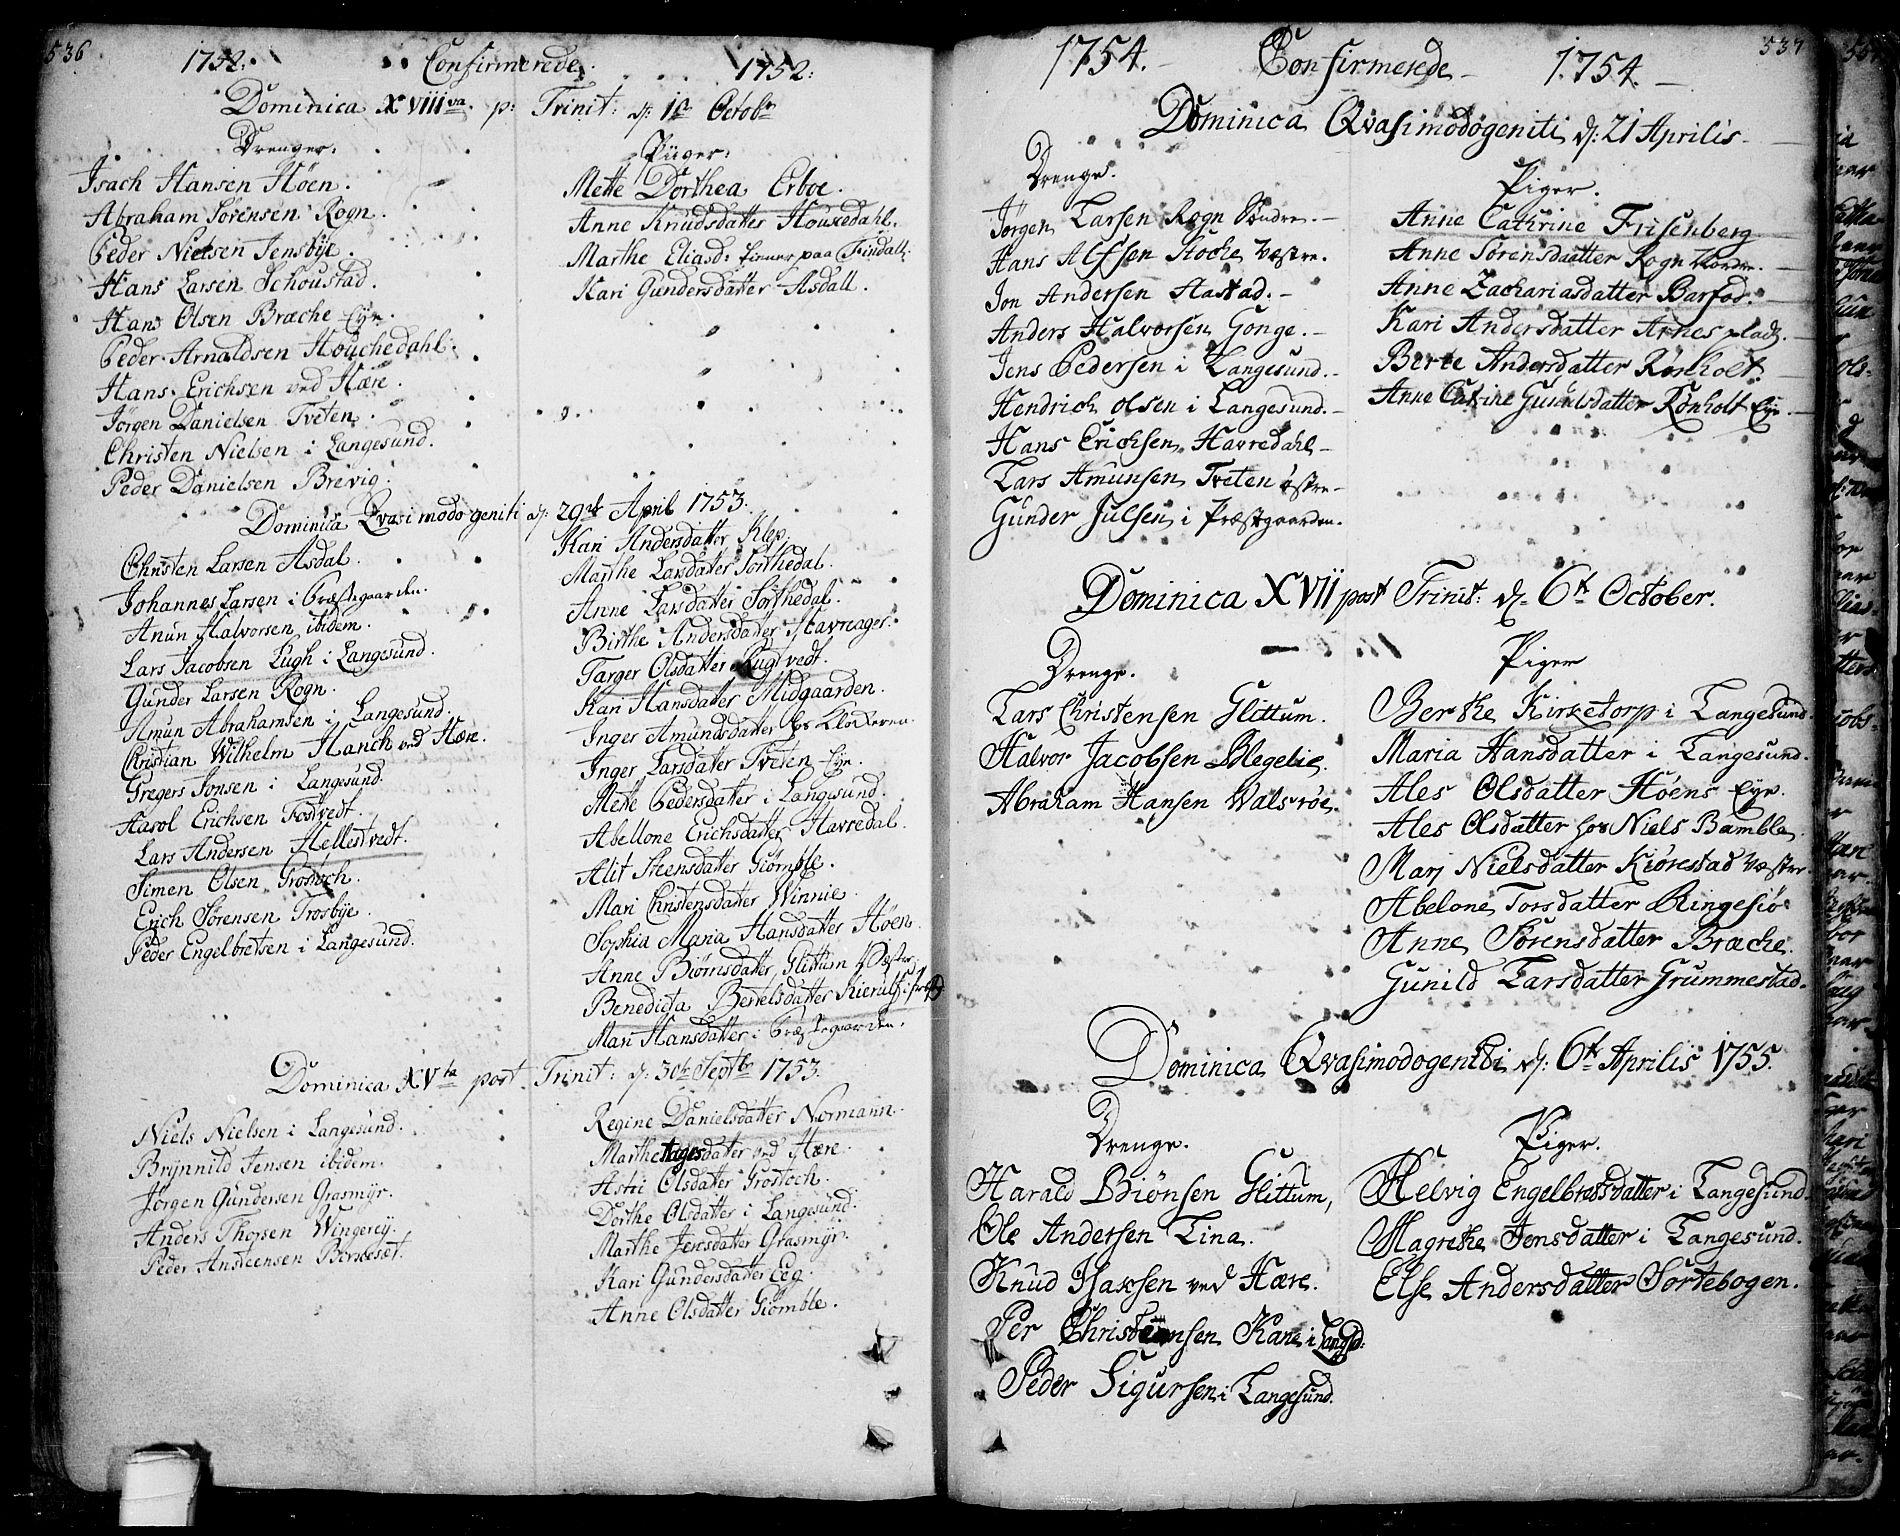 SAKO, Bamble kirkebøker, F/Fa/L0001: Ministerialbok nr. I 1, 1702-1774, s. 536-537